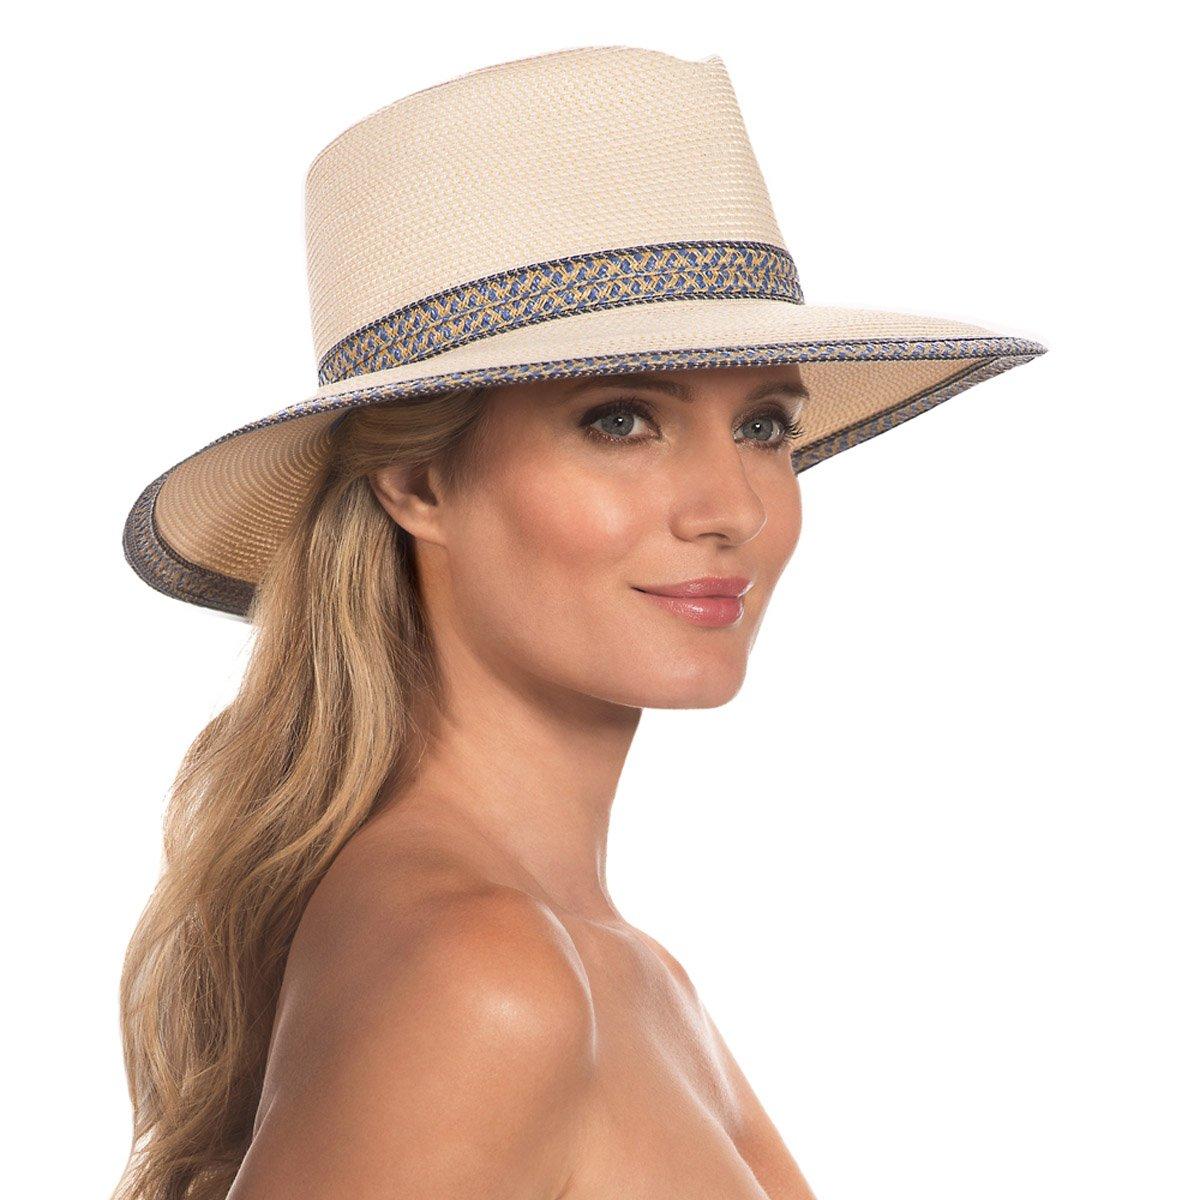 Eric Javits Luxury Fashion Designer Women's Headwear Hat - Georgia - Cream/Blue Tweed by Eric Javits